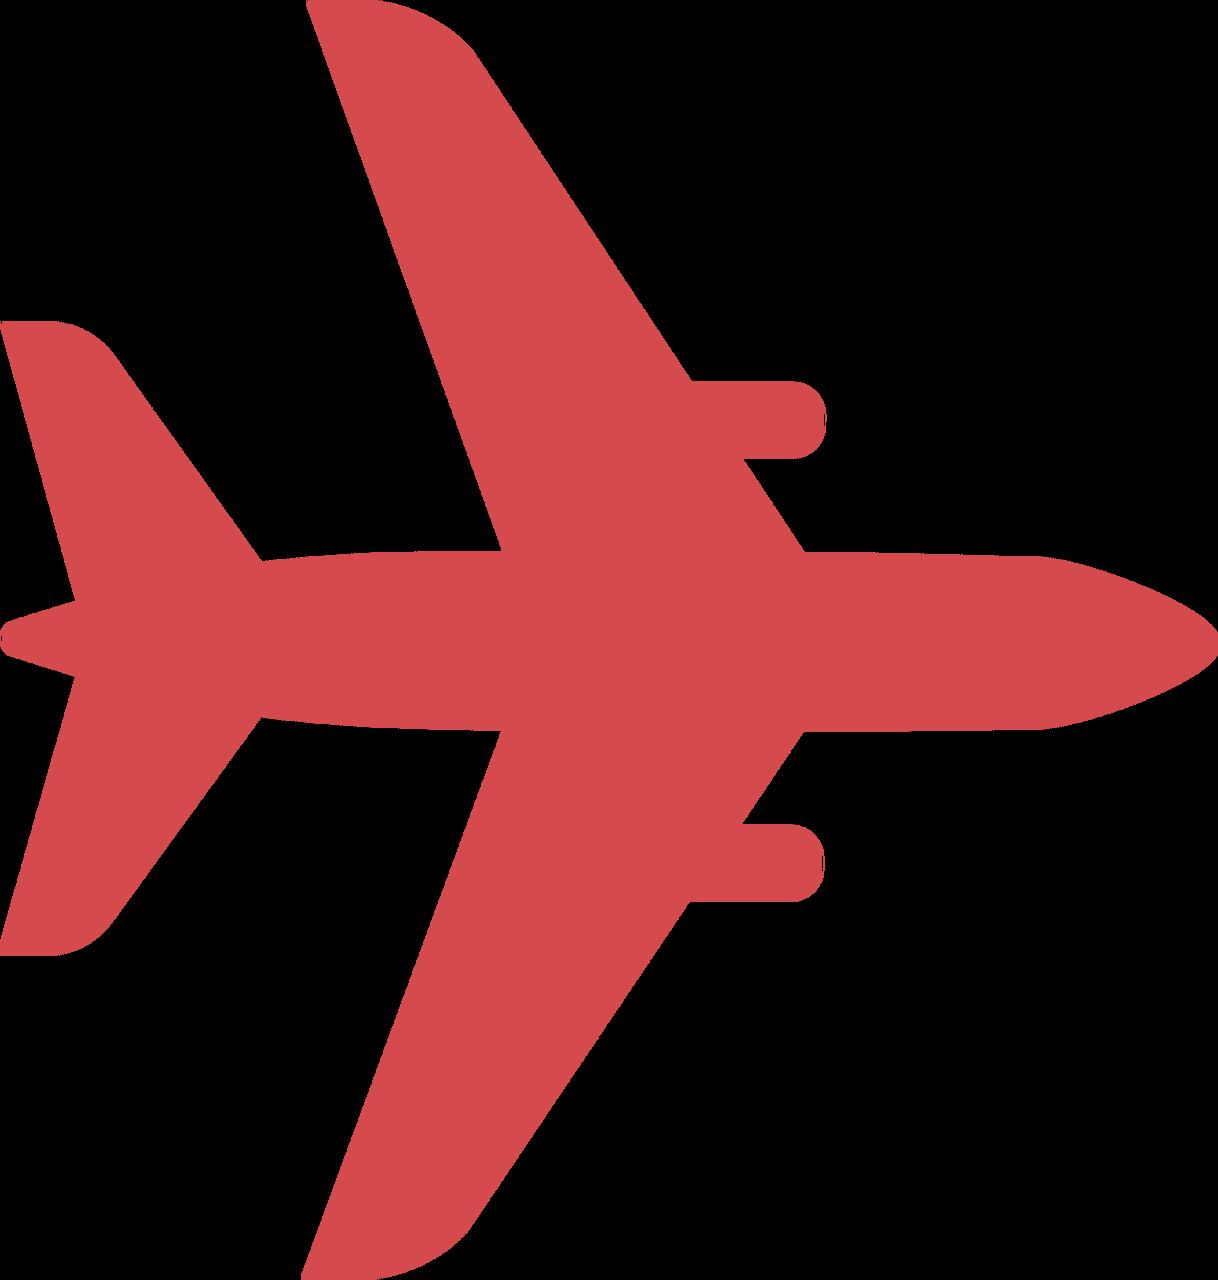 Airplane #2 SVG Cut File